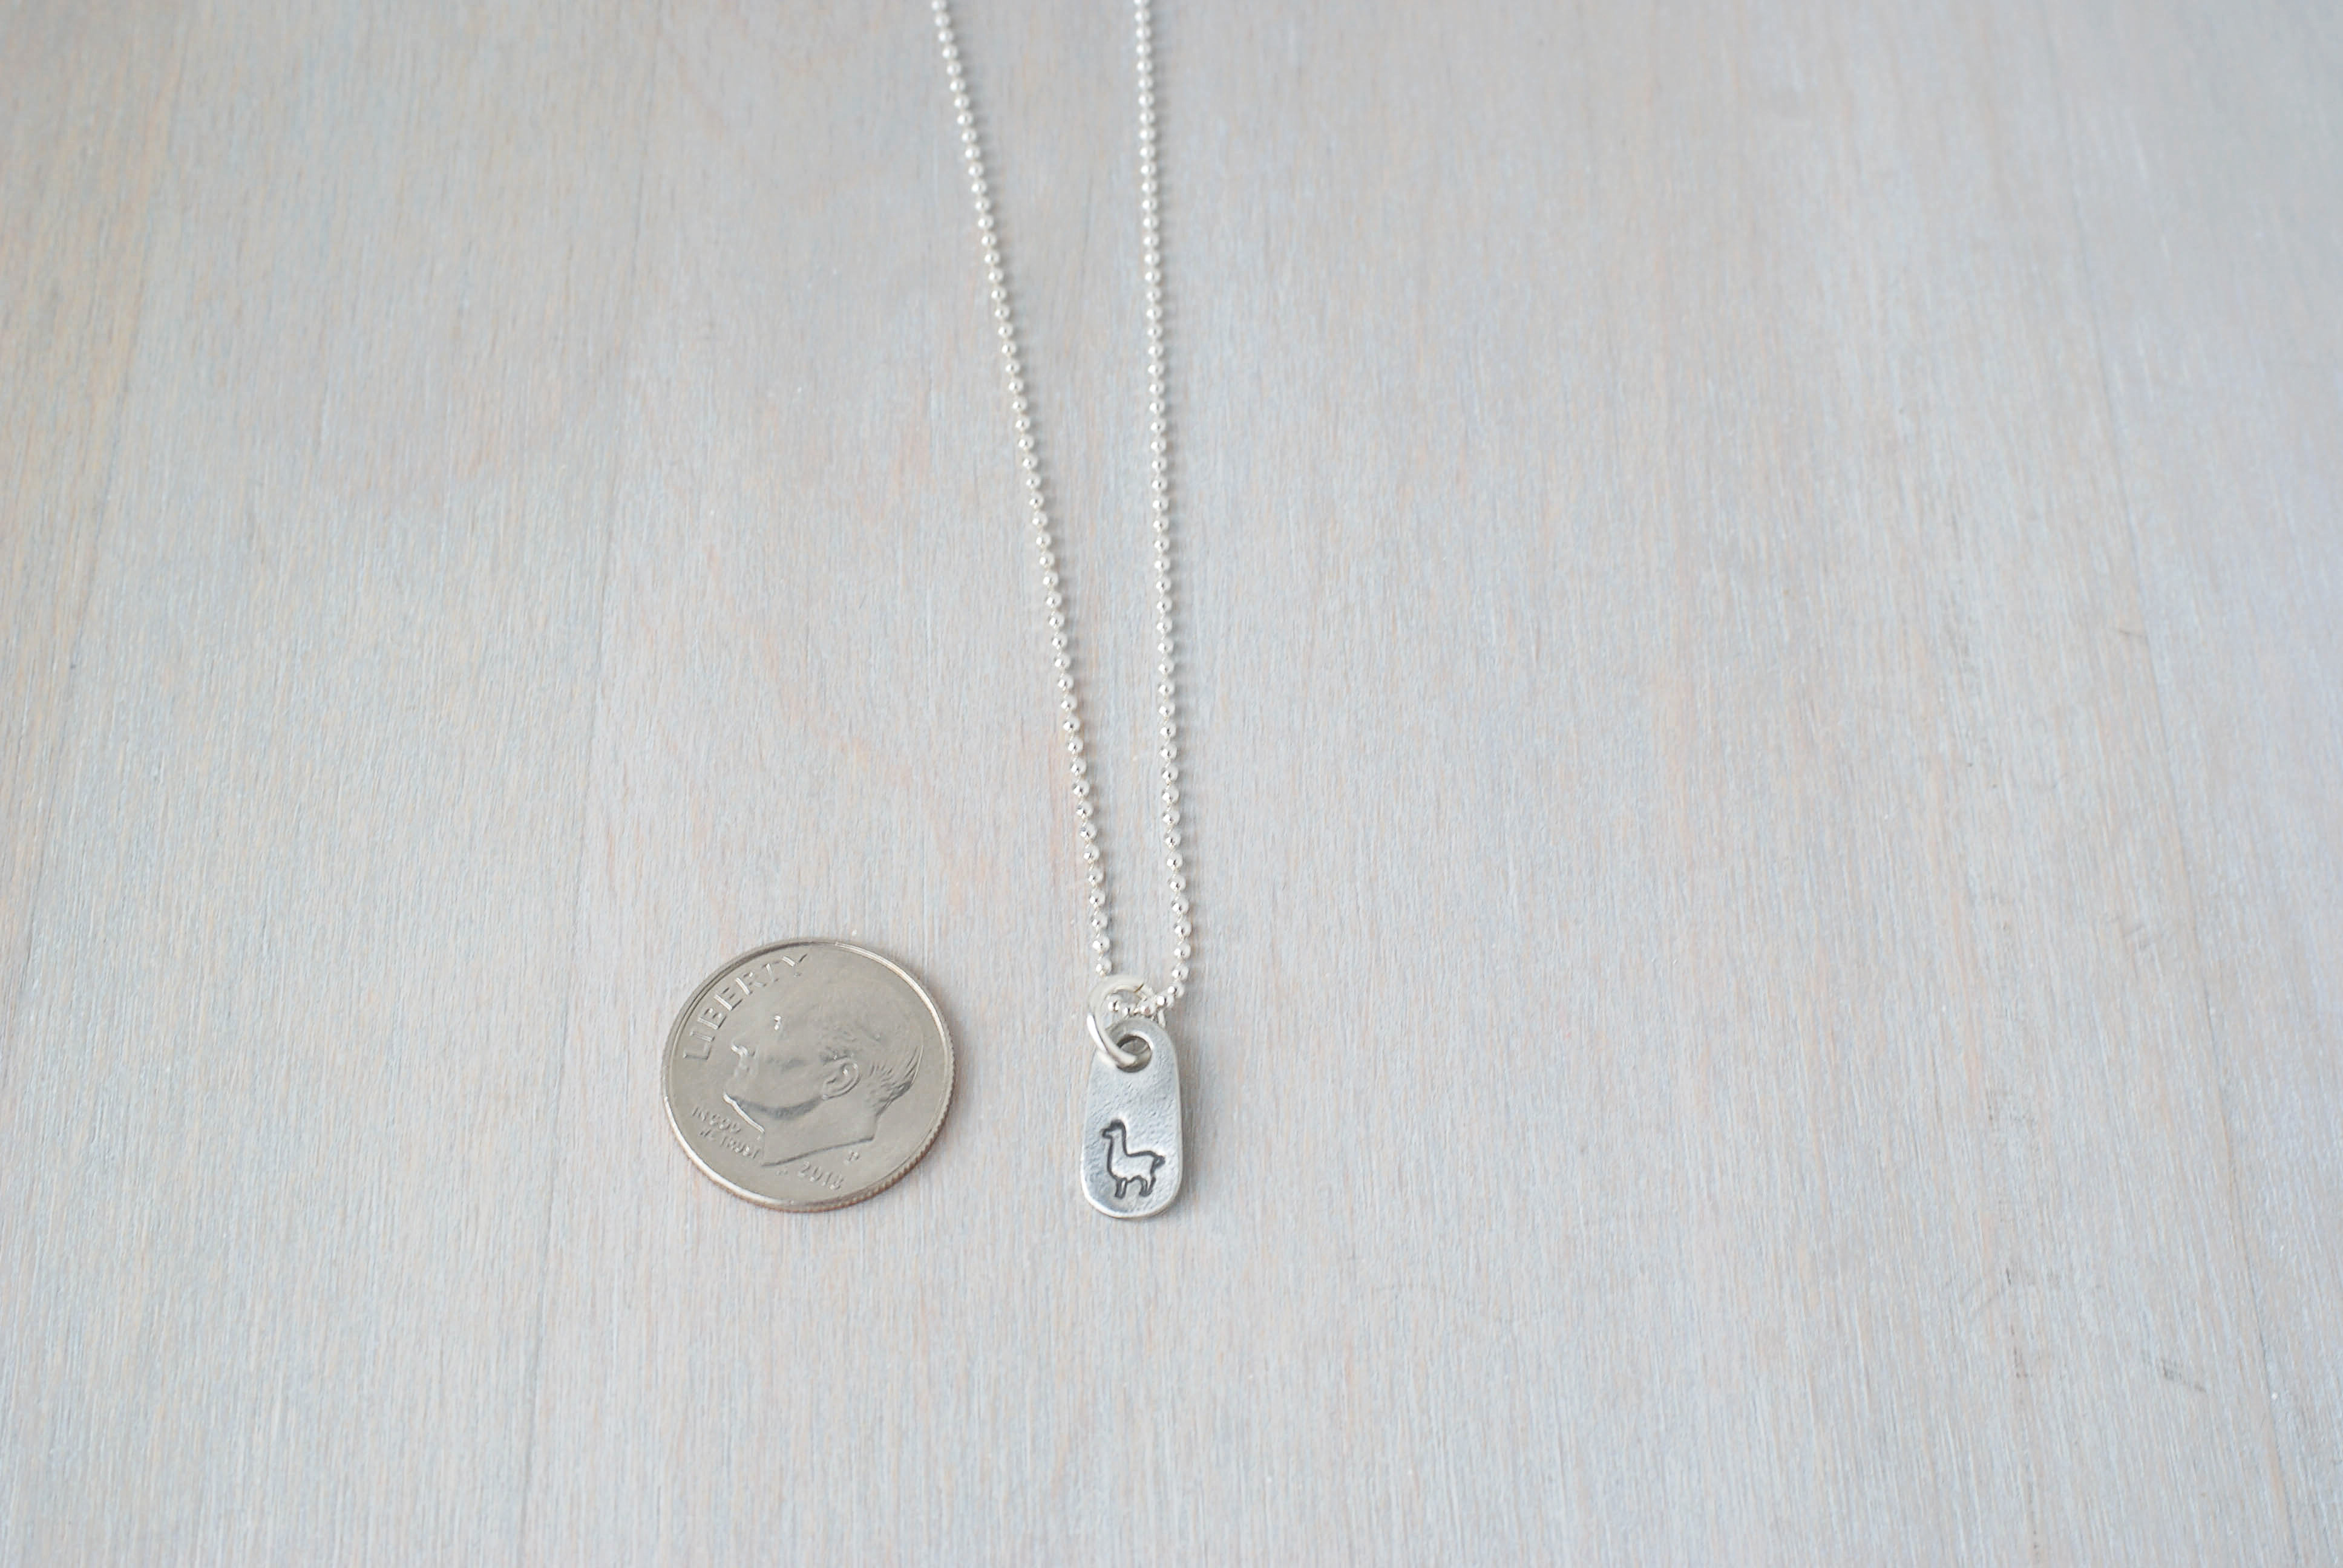 Llama Necklace in Artisan Pewter